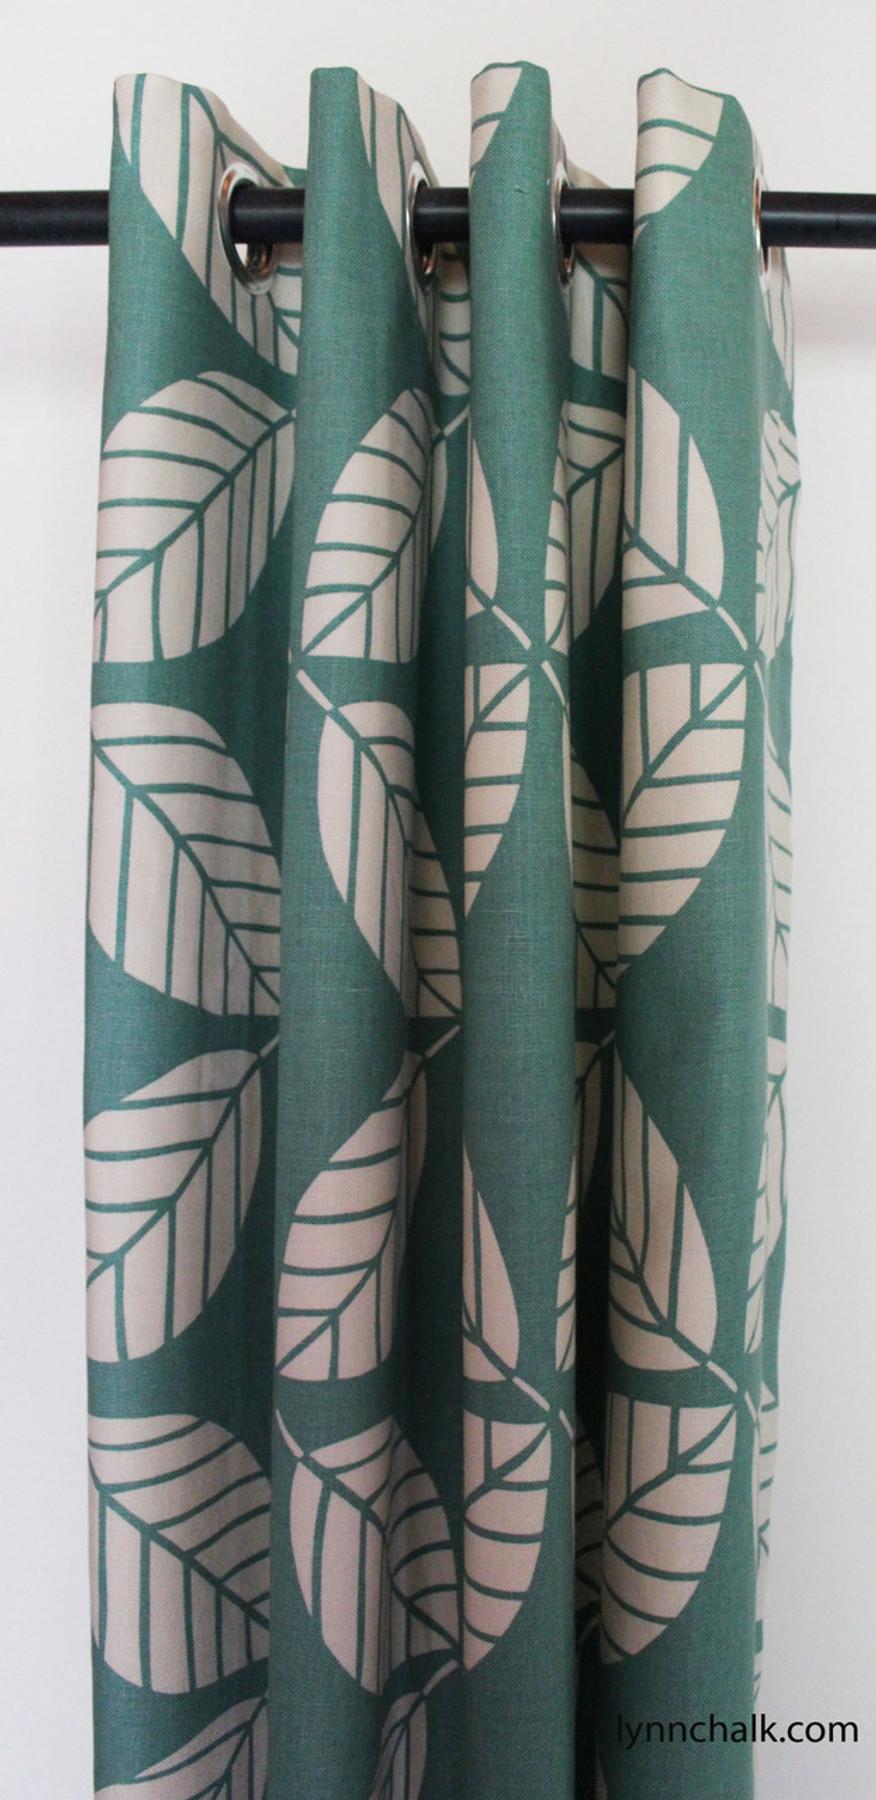 Custom Grommet Drapes by Lynn Chalk in Duralee 42190-23 Peacock